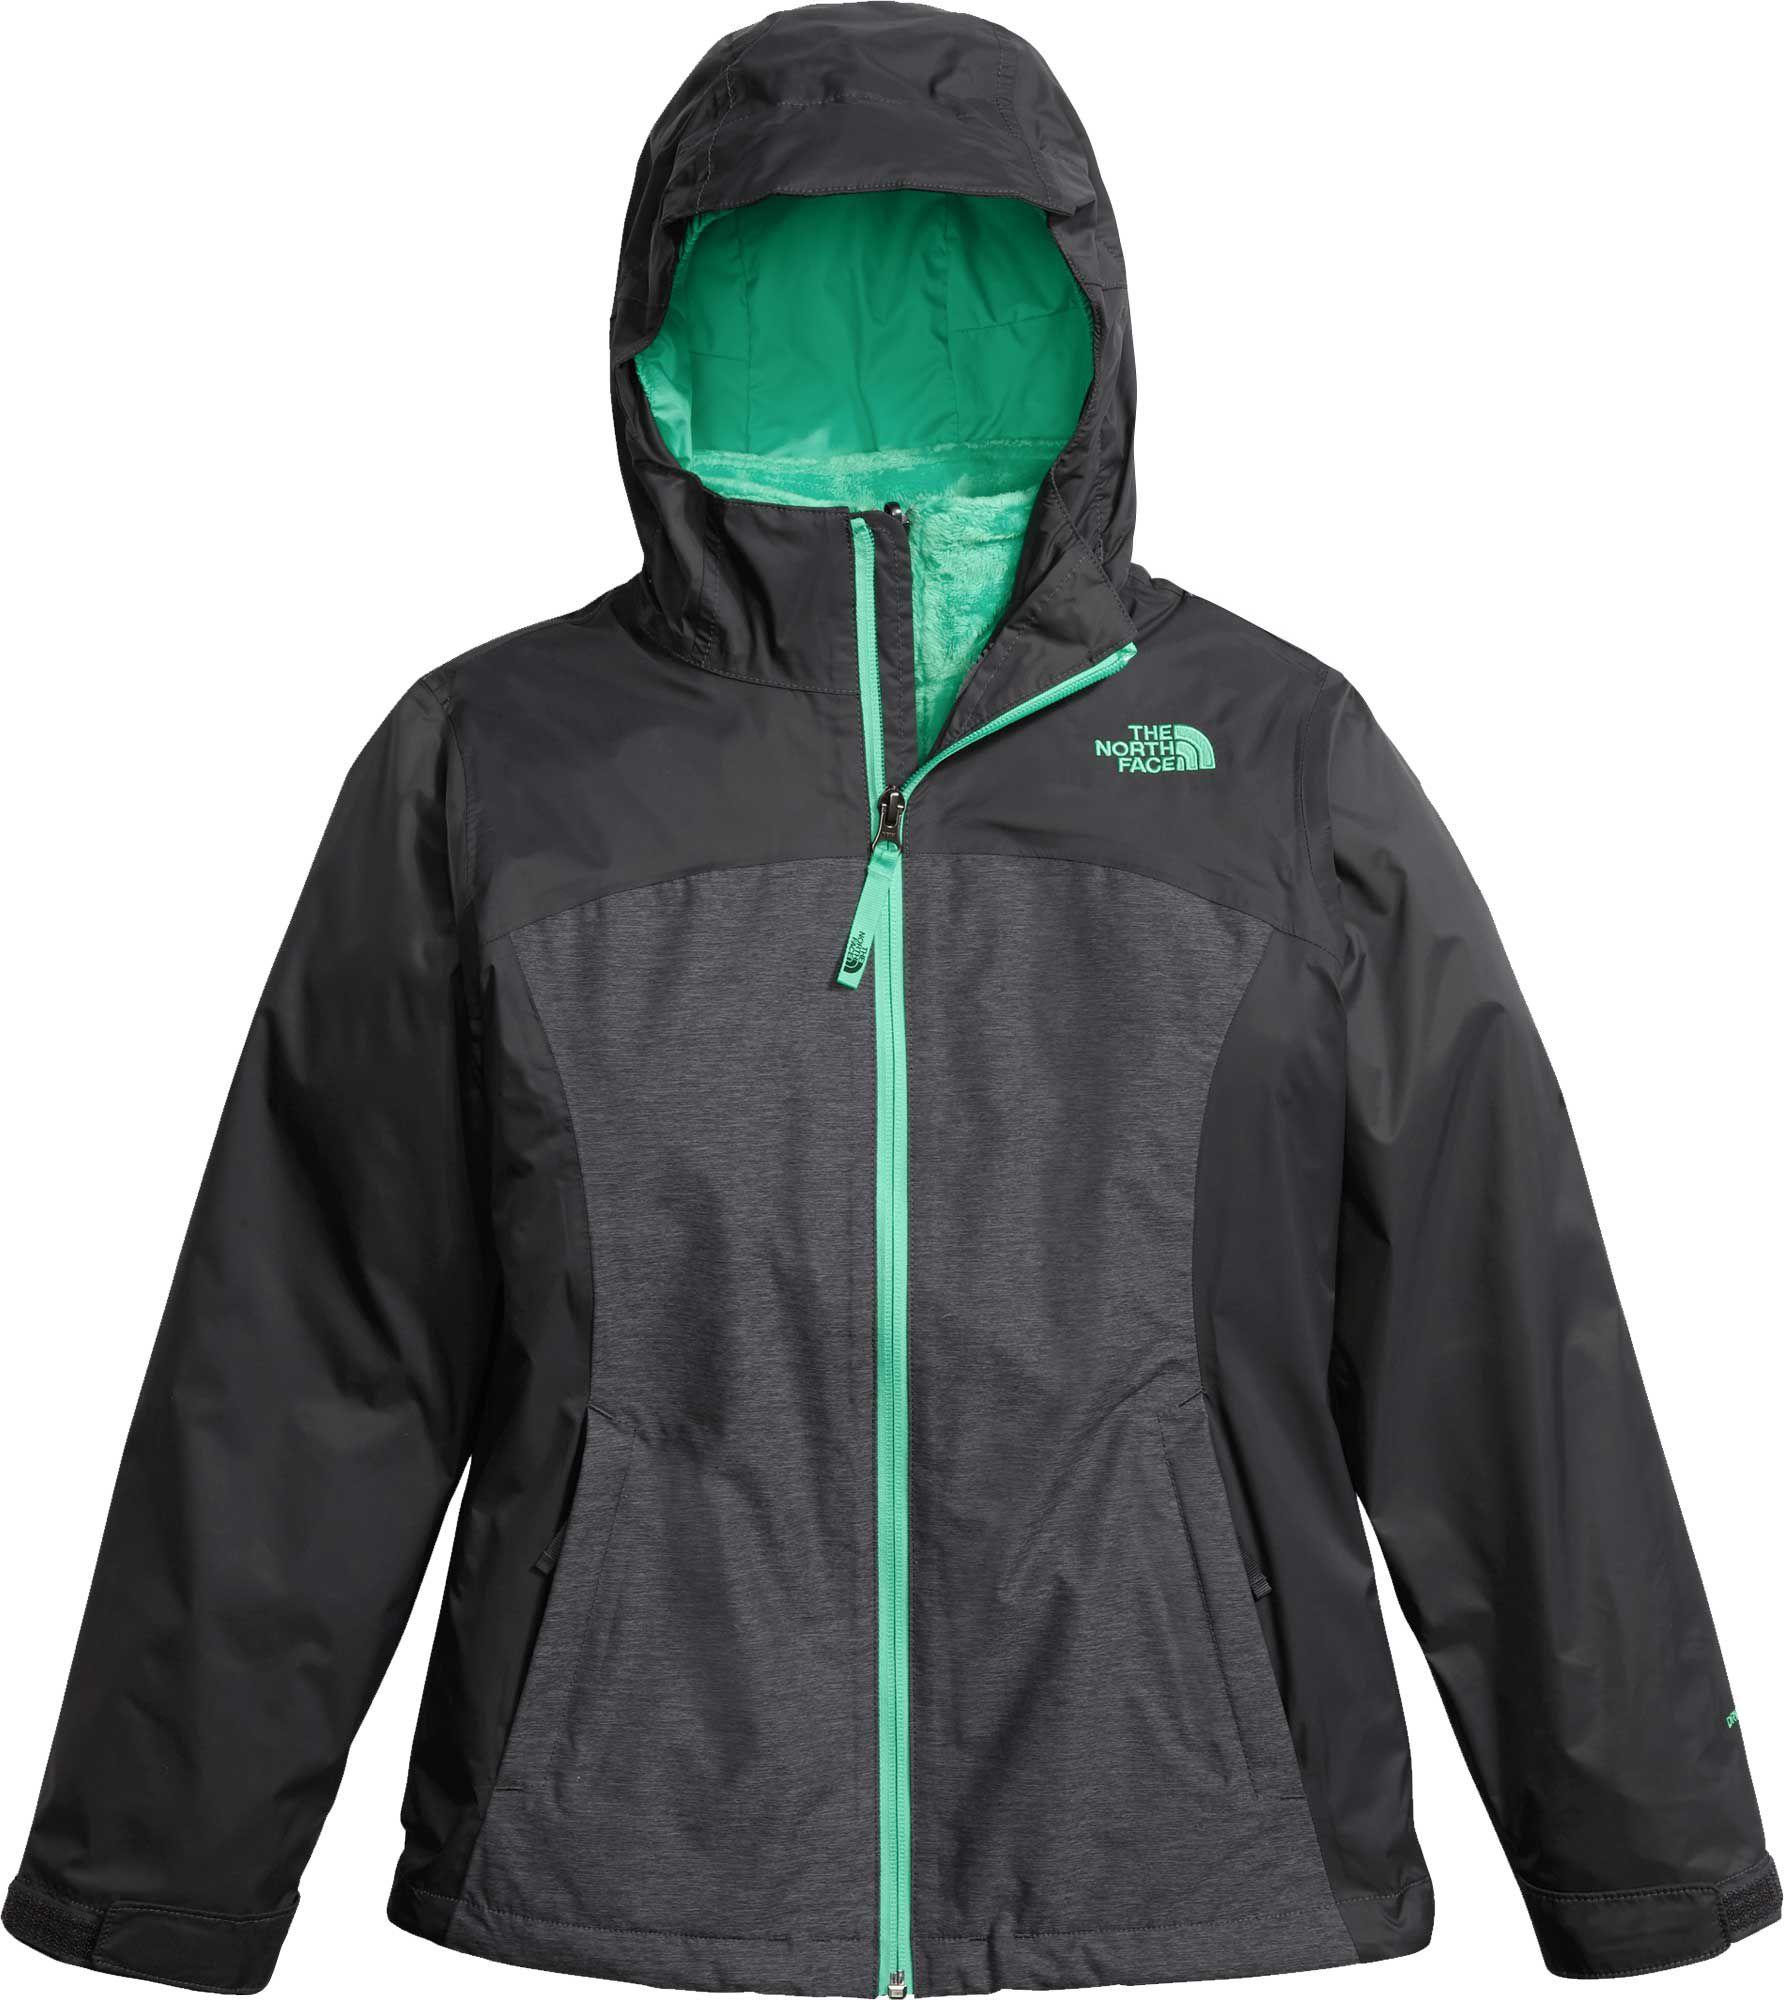 Girls' 3 in 1 Winter Coats & Jackets | DICK'S Sporting Goods